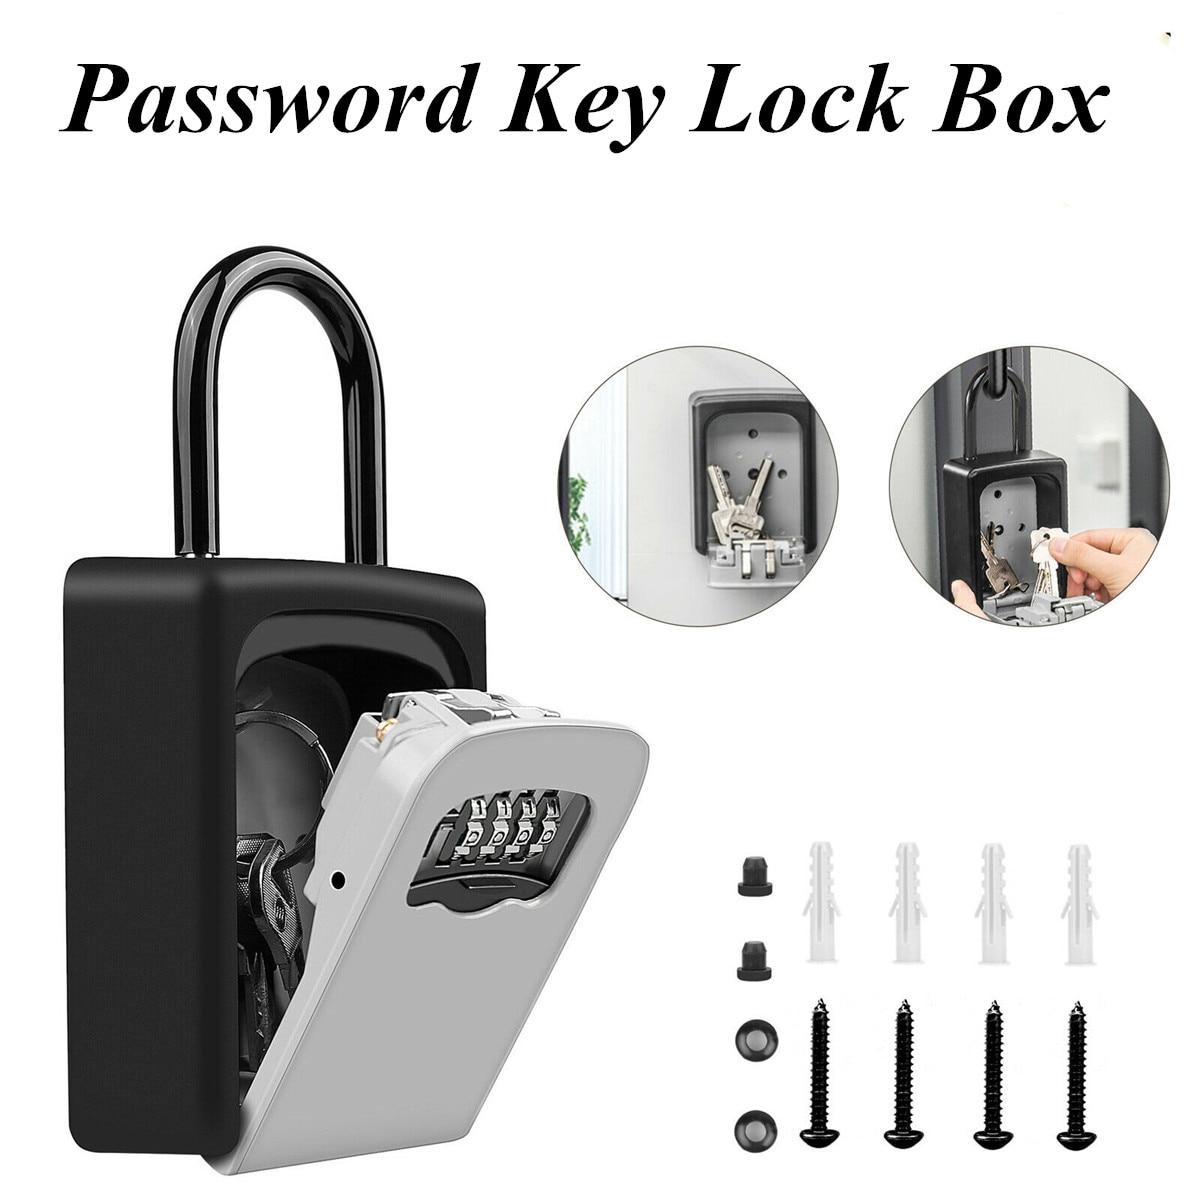 NEW 4 Digit Combination Key Storage Key Lock Box Wall Mounted Aluminum Alloy Key Safe Box Weatherproof Lock Box Outdoor